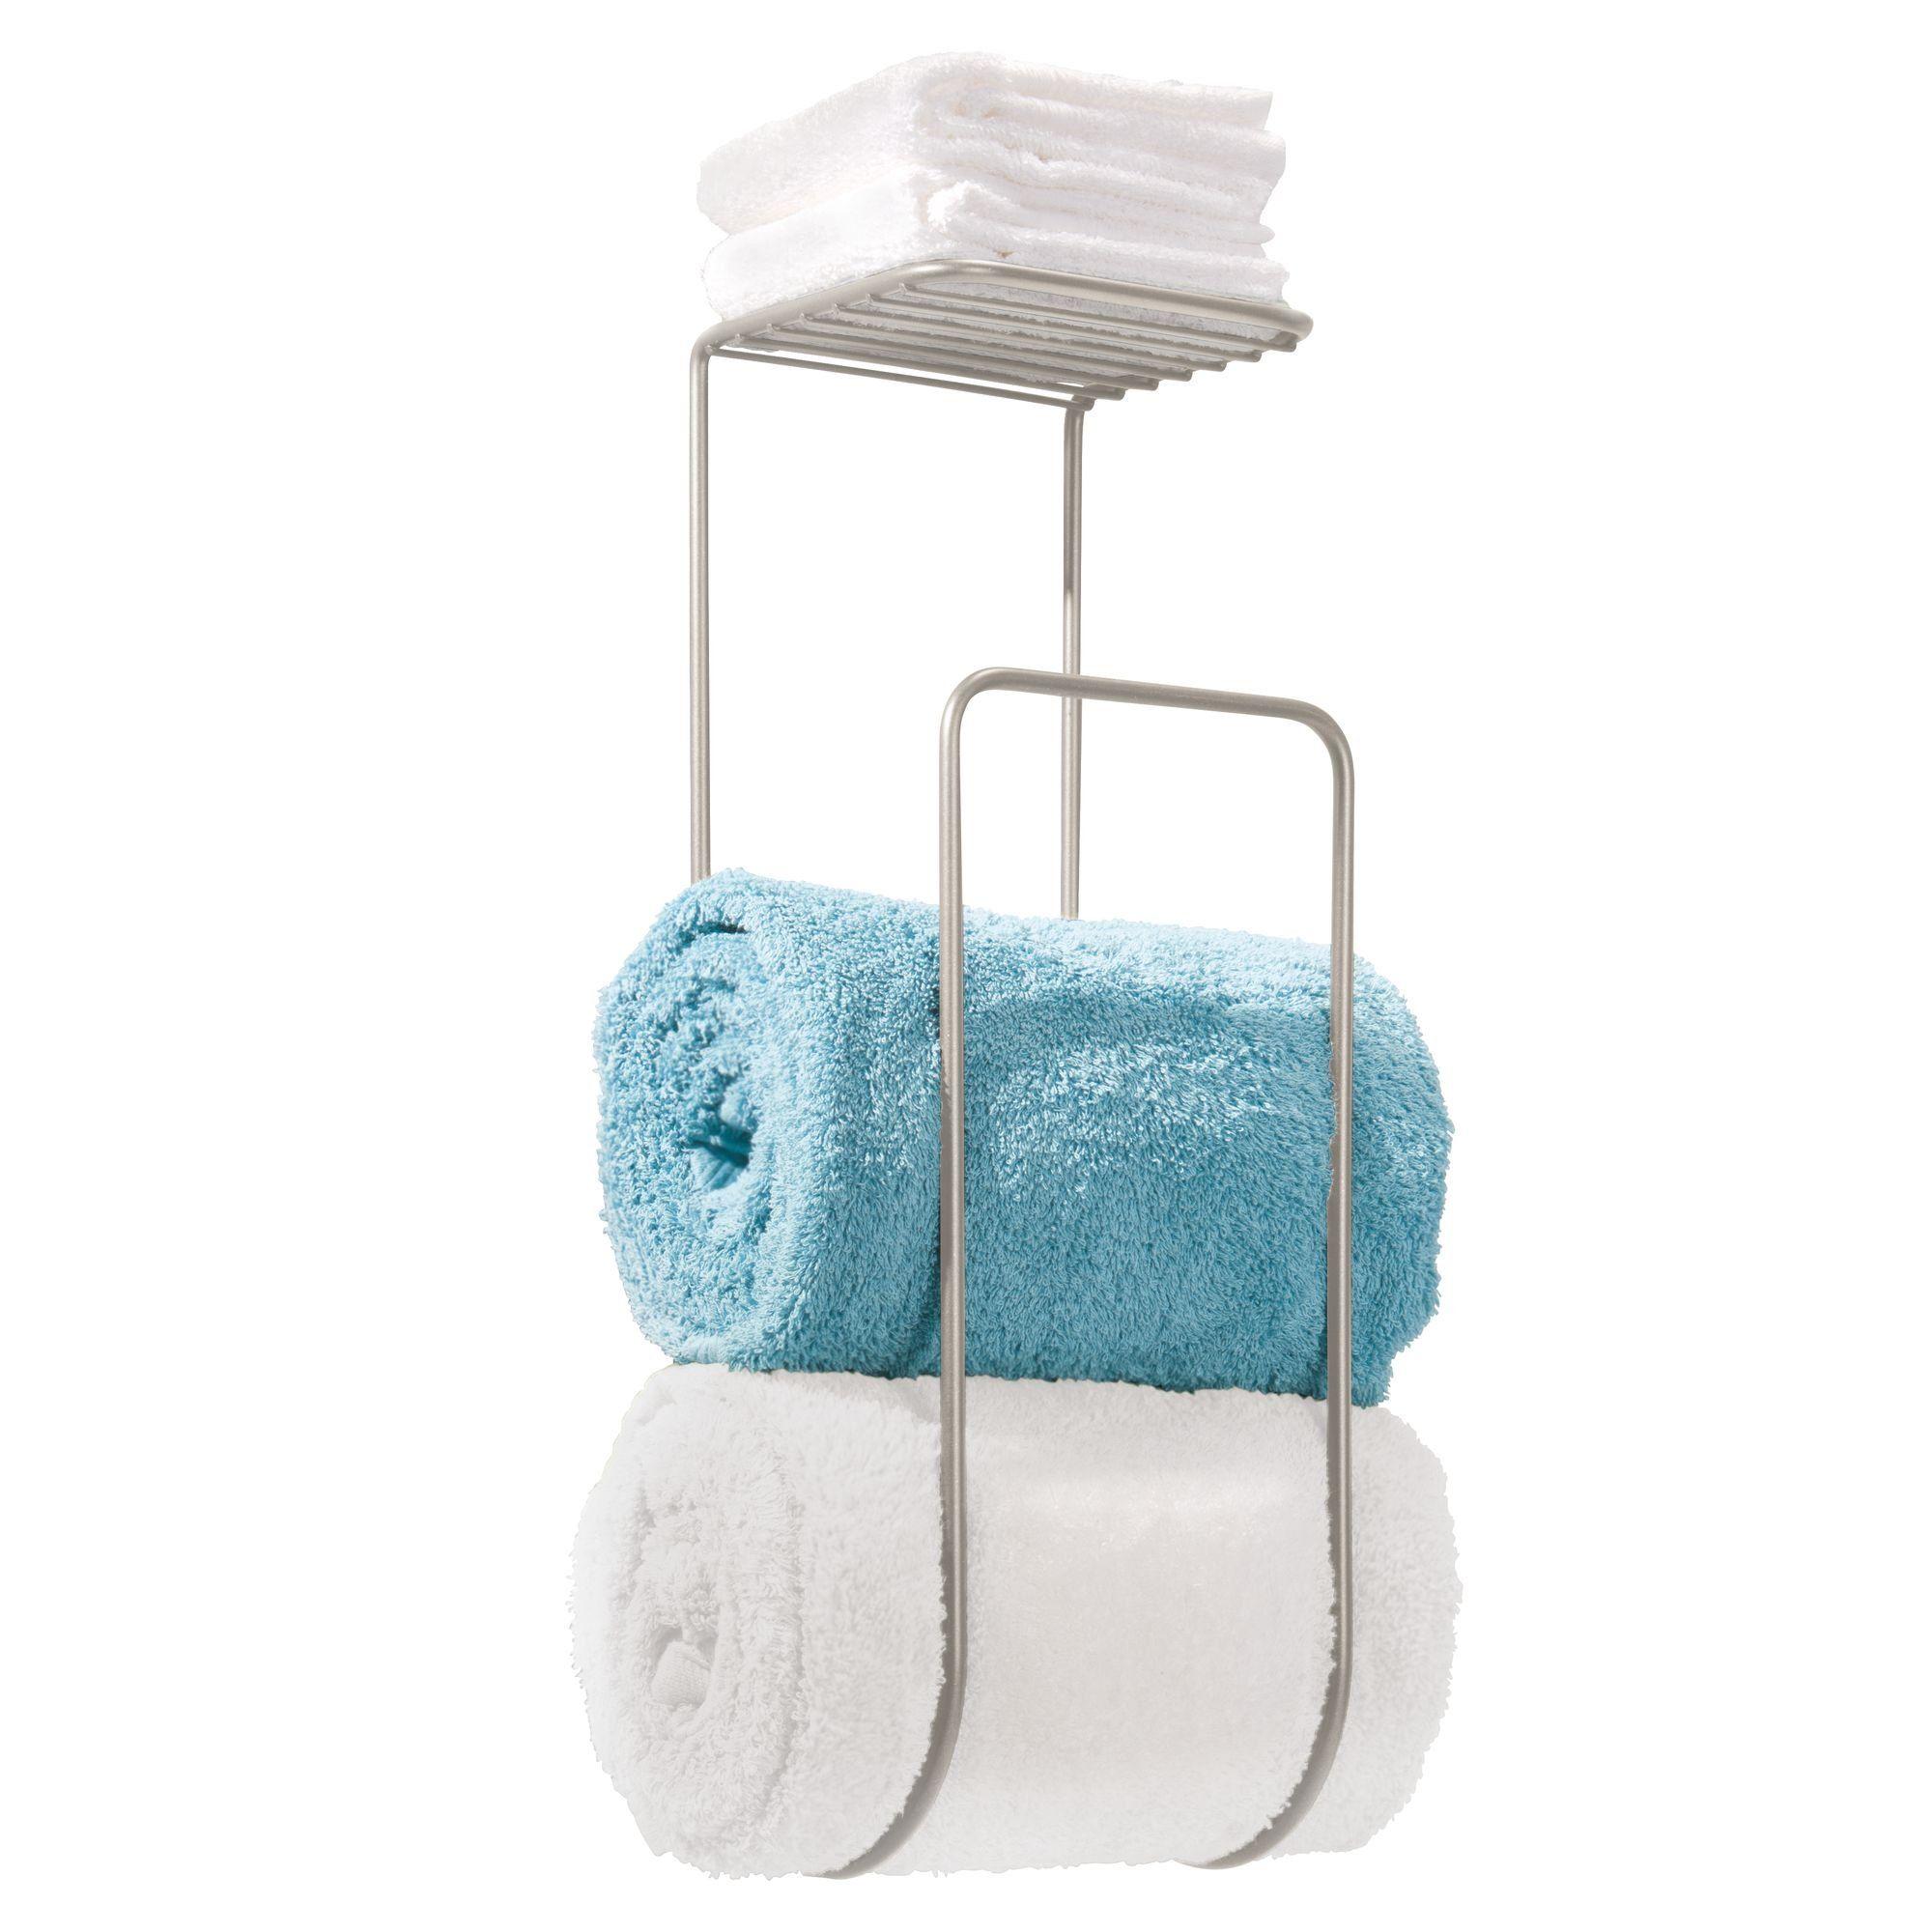 mDesign Towel Holder with Shelf for Bathroom - Wall Mount, Satin ...